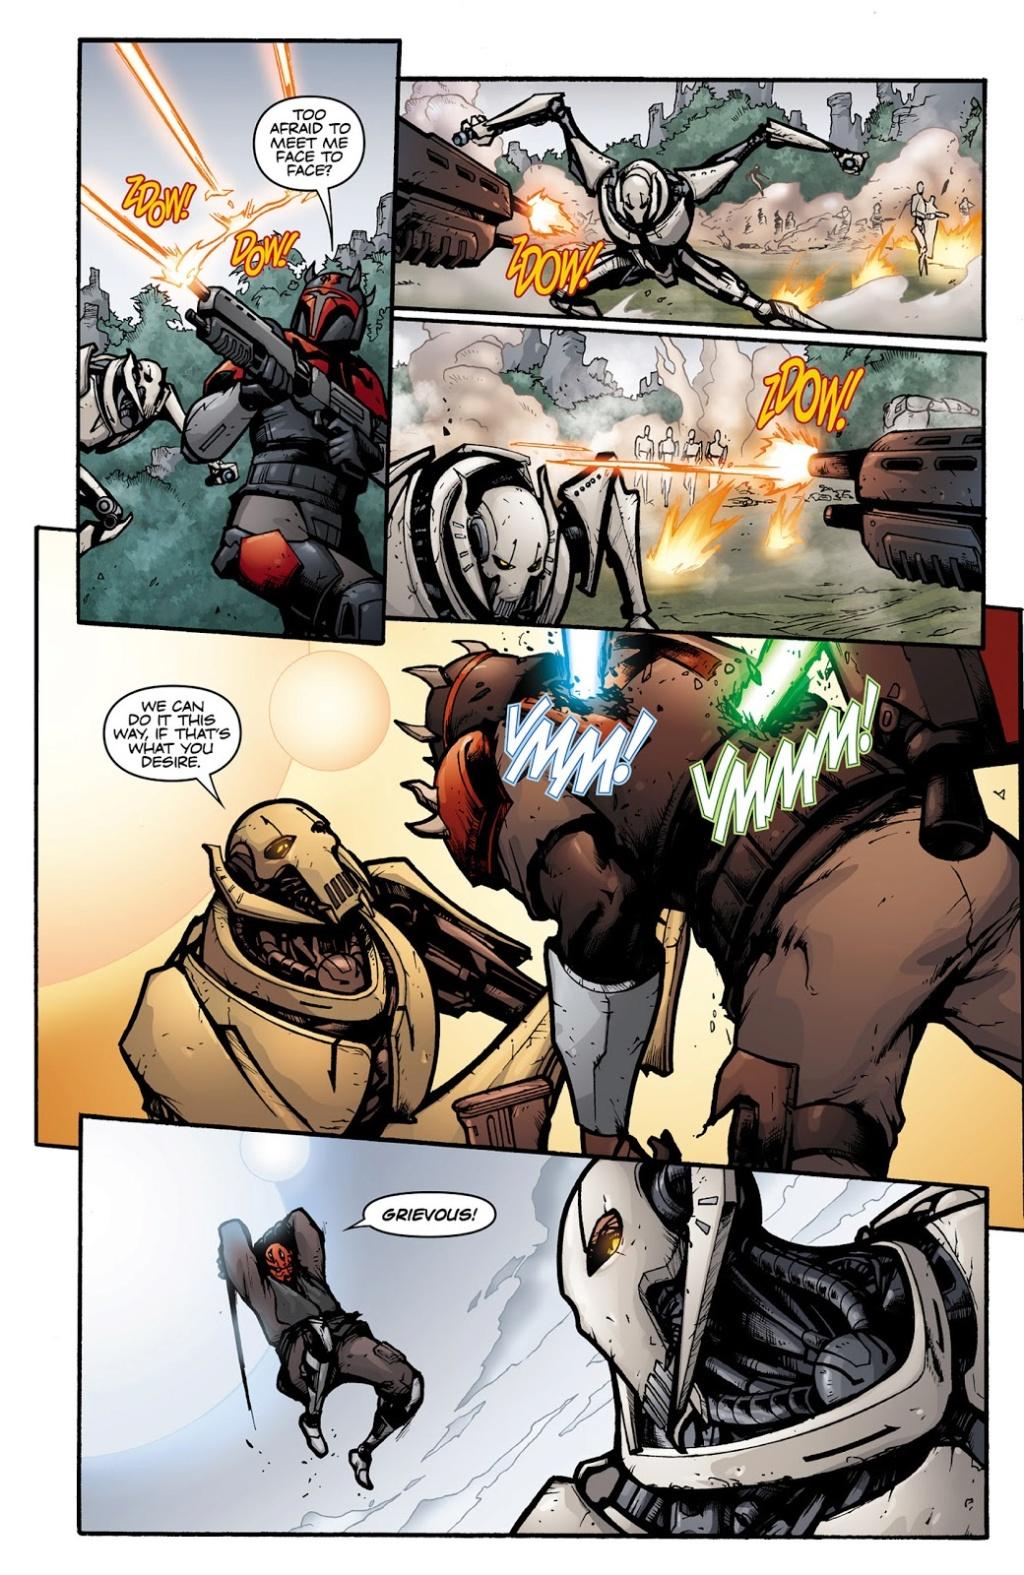 SS - Darth Maul (IG) vs. Darth Vader (BreakofDawn) Rco02014